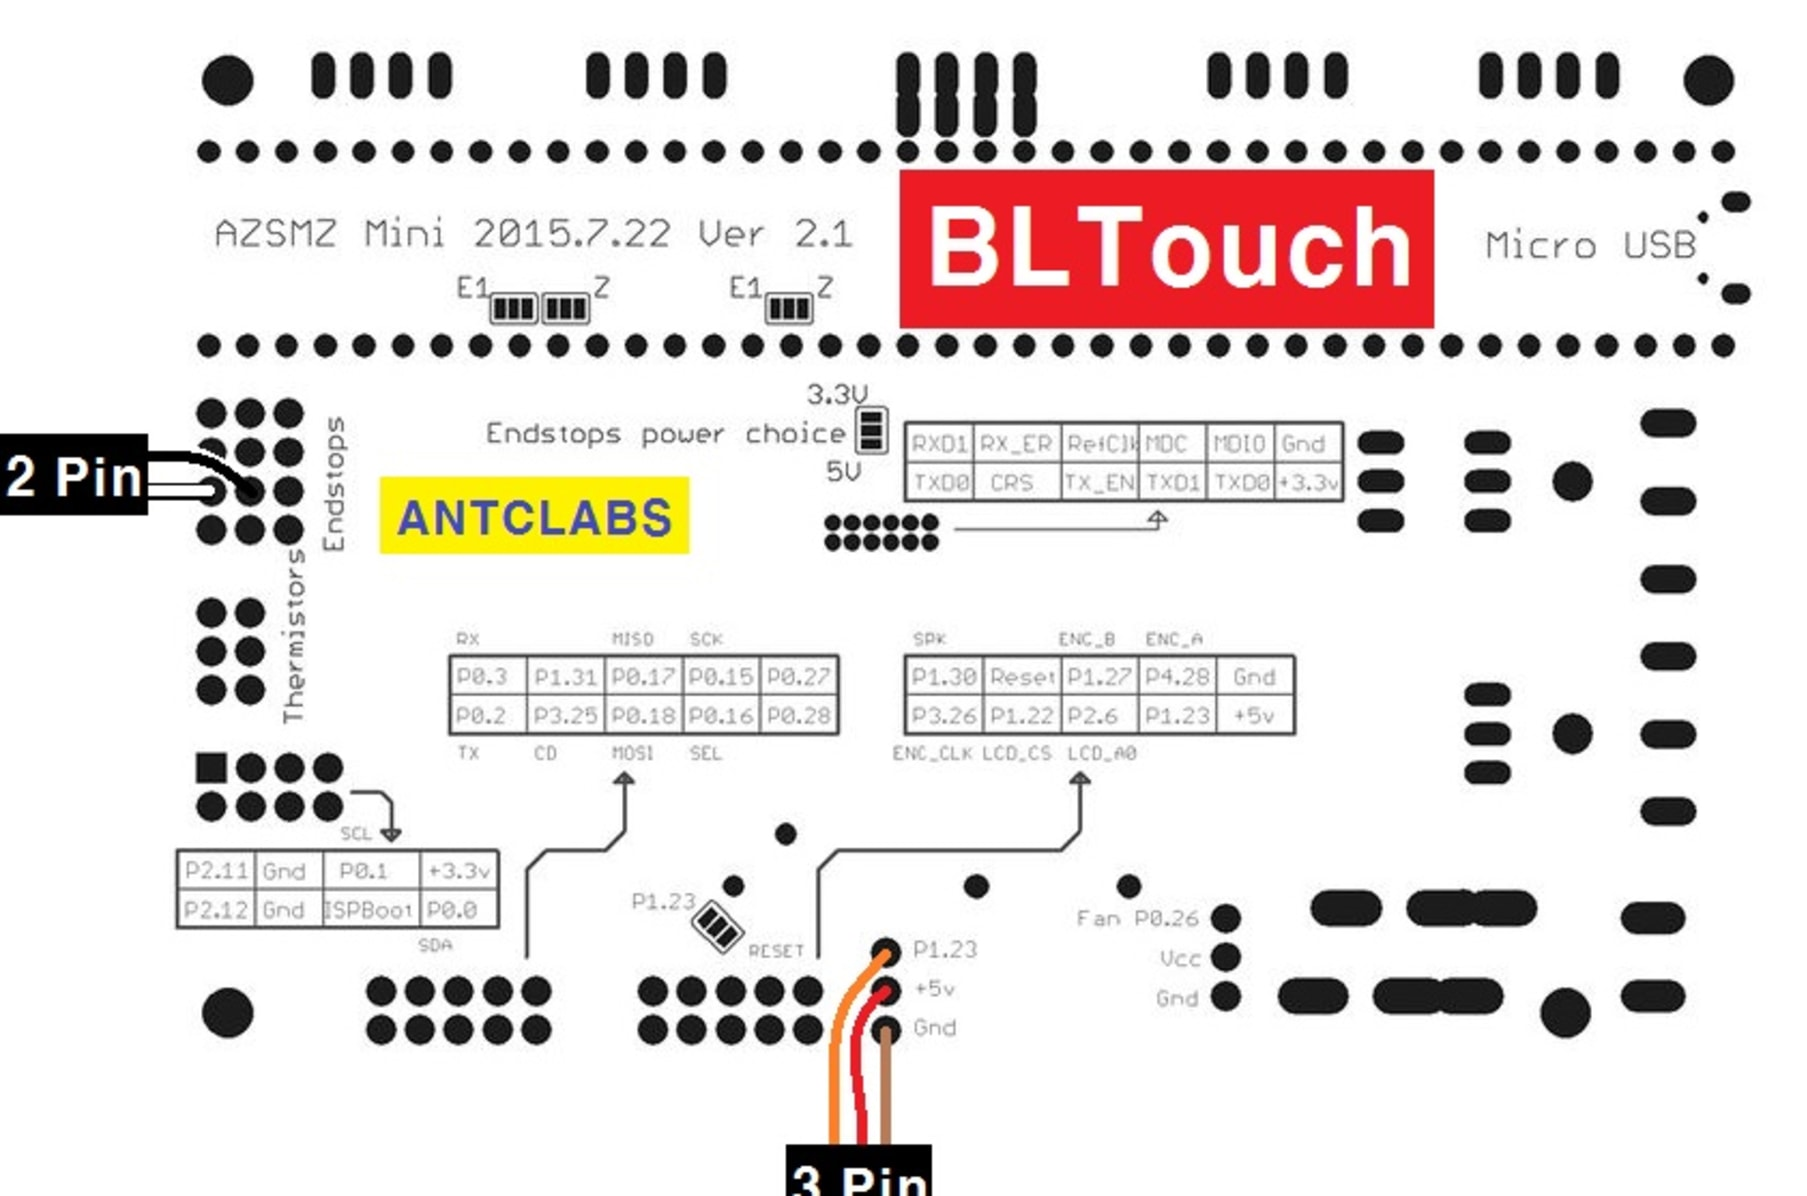 Bltouch Wiring Diagram from c1.iggcdn.com